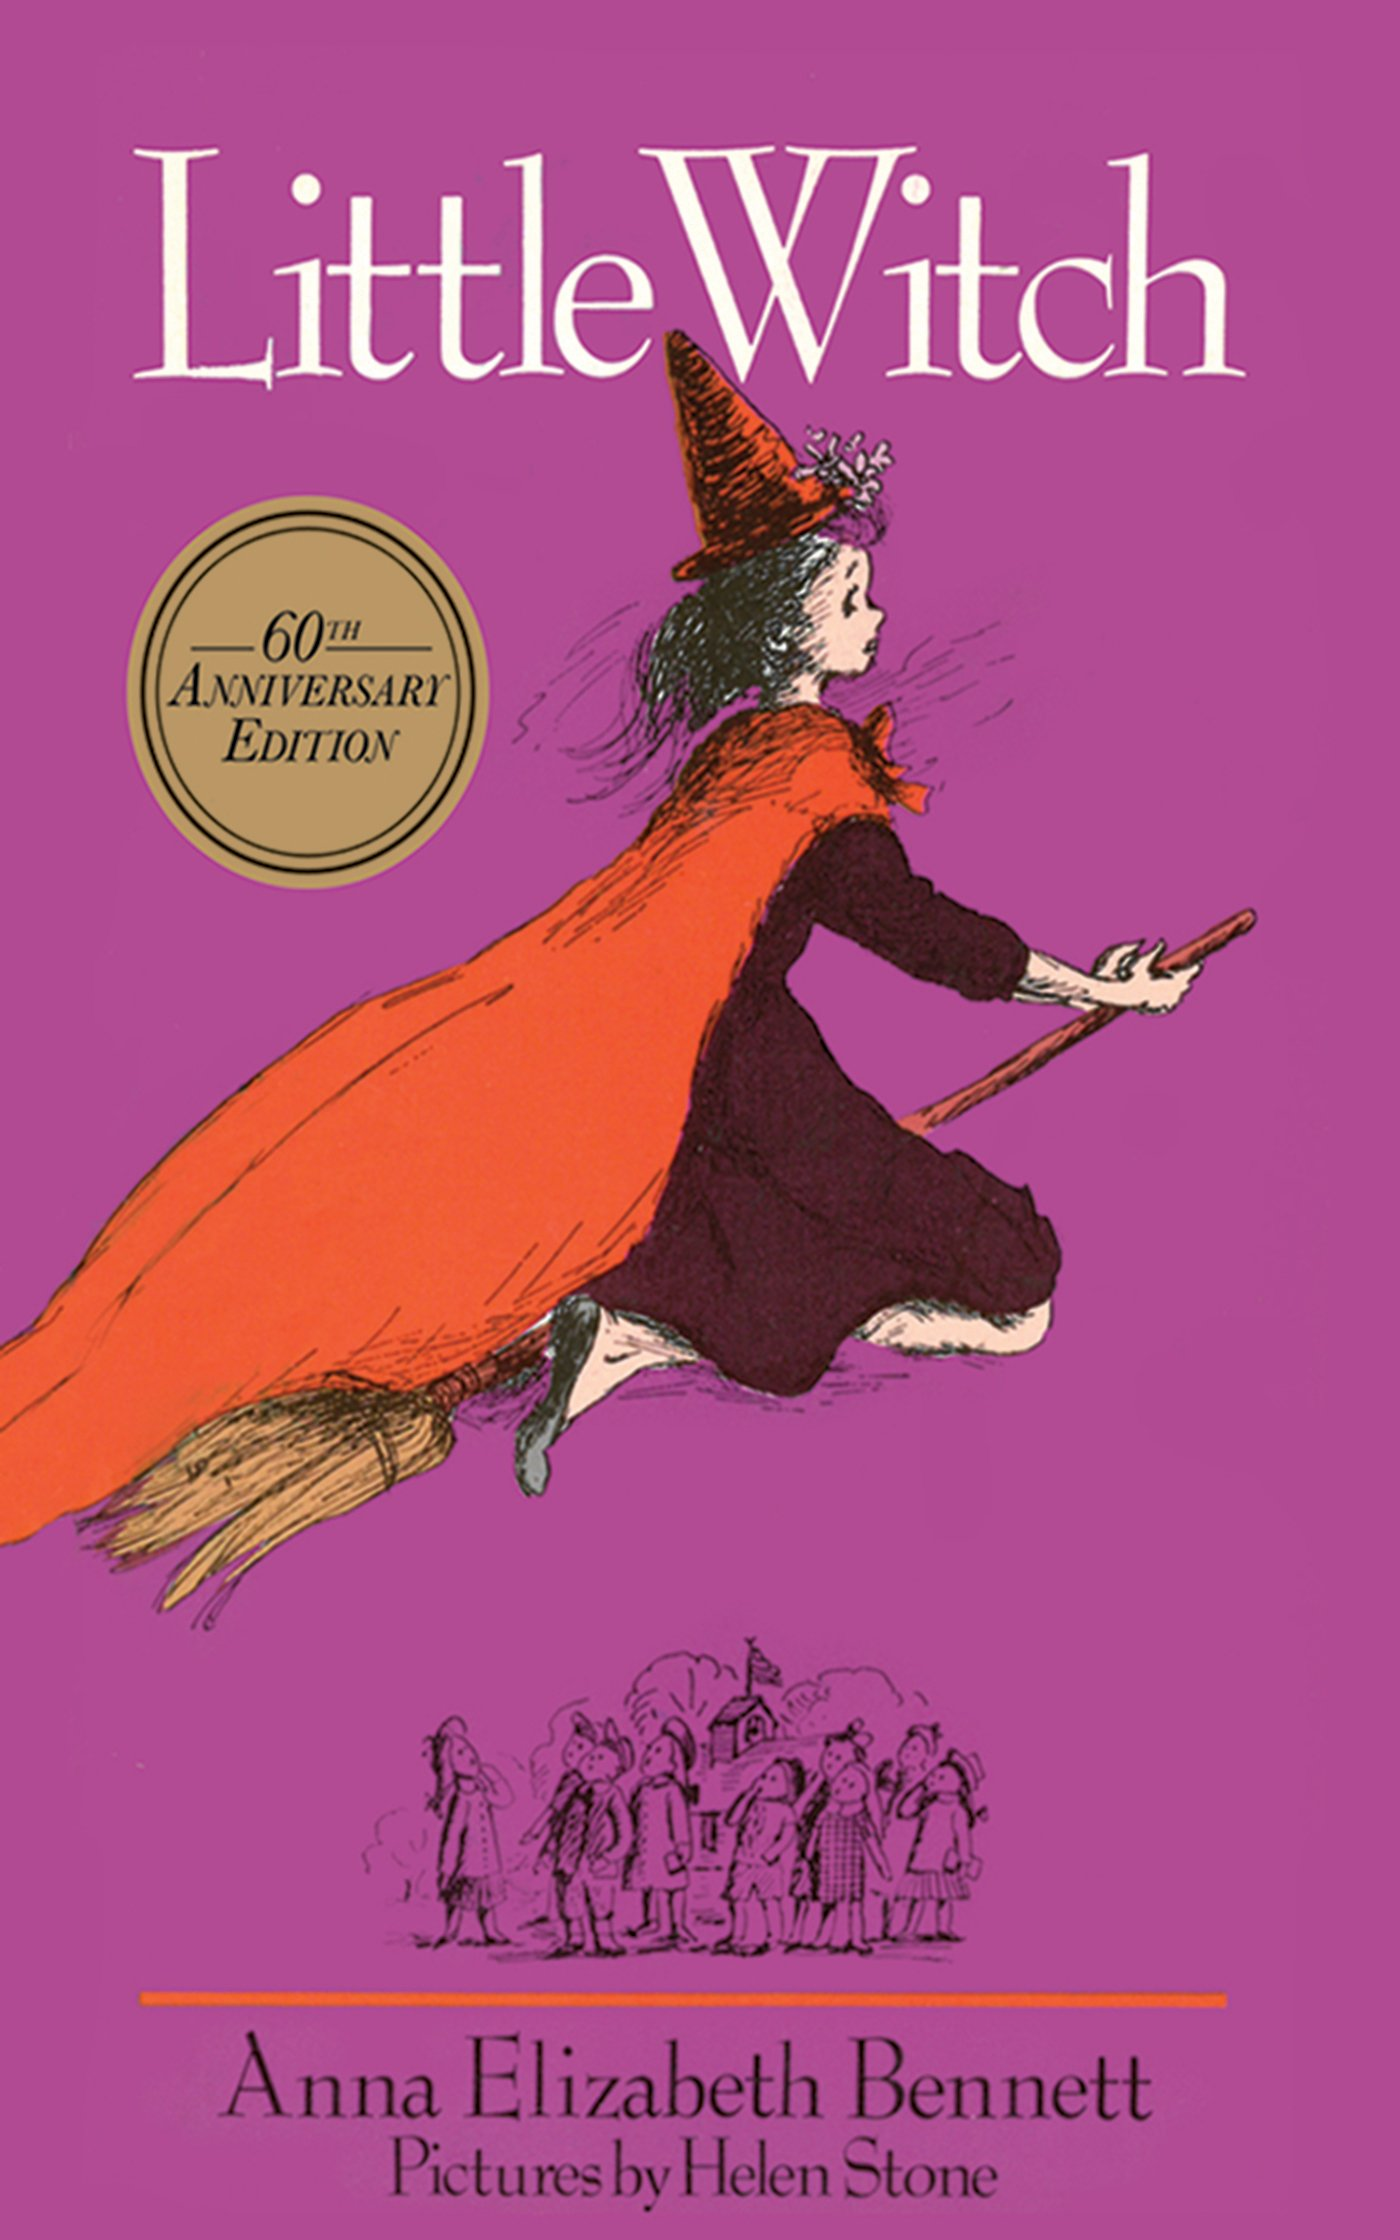 Image result for little witch anna elizabeth bennett